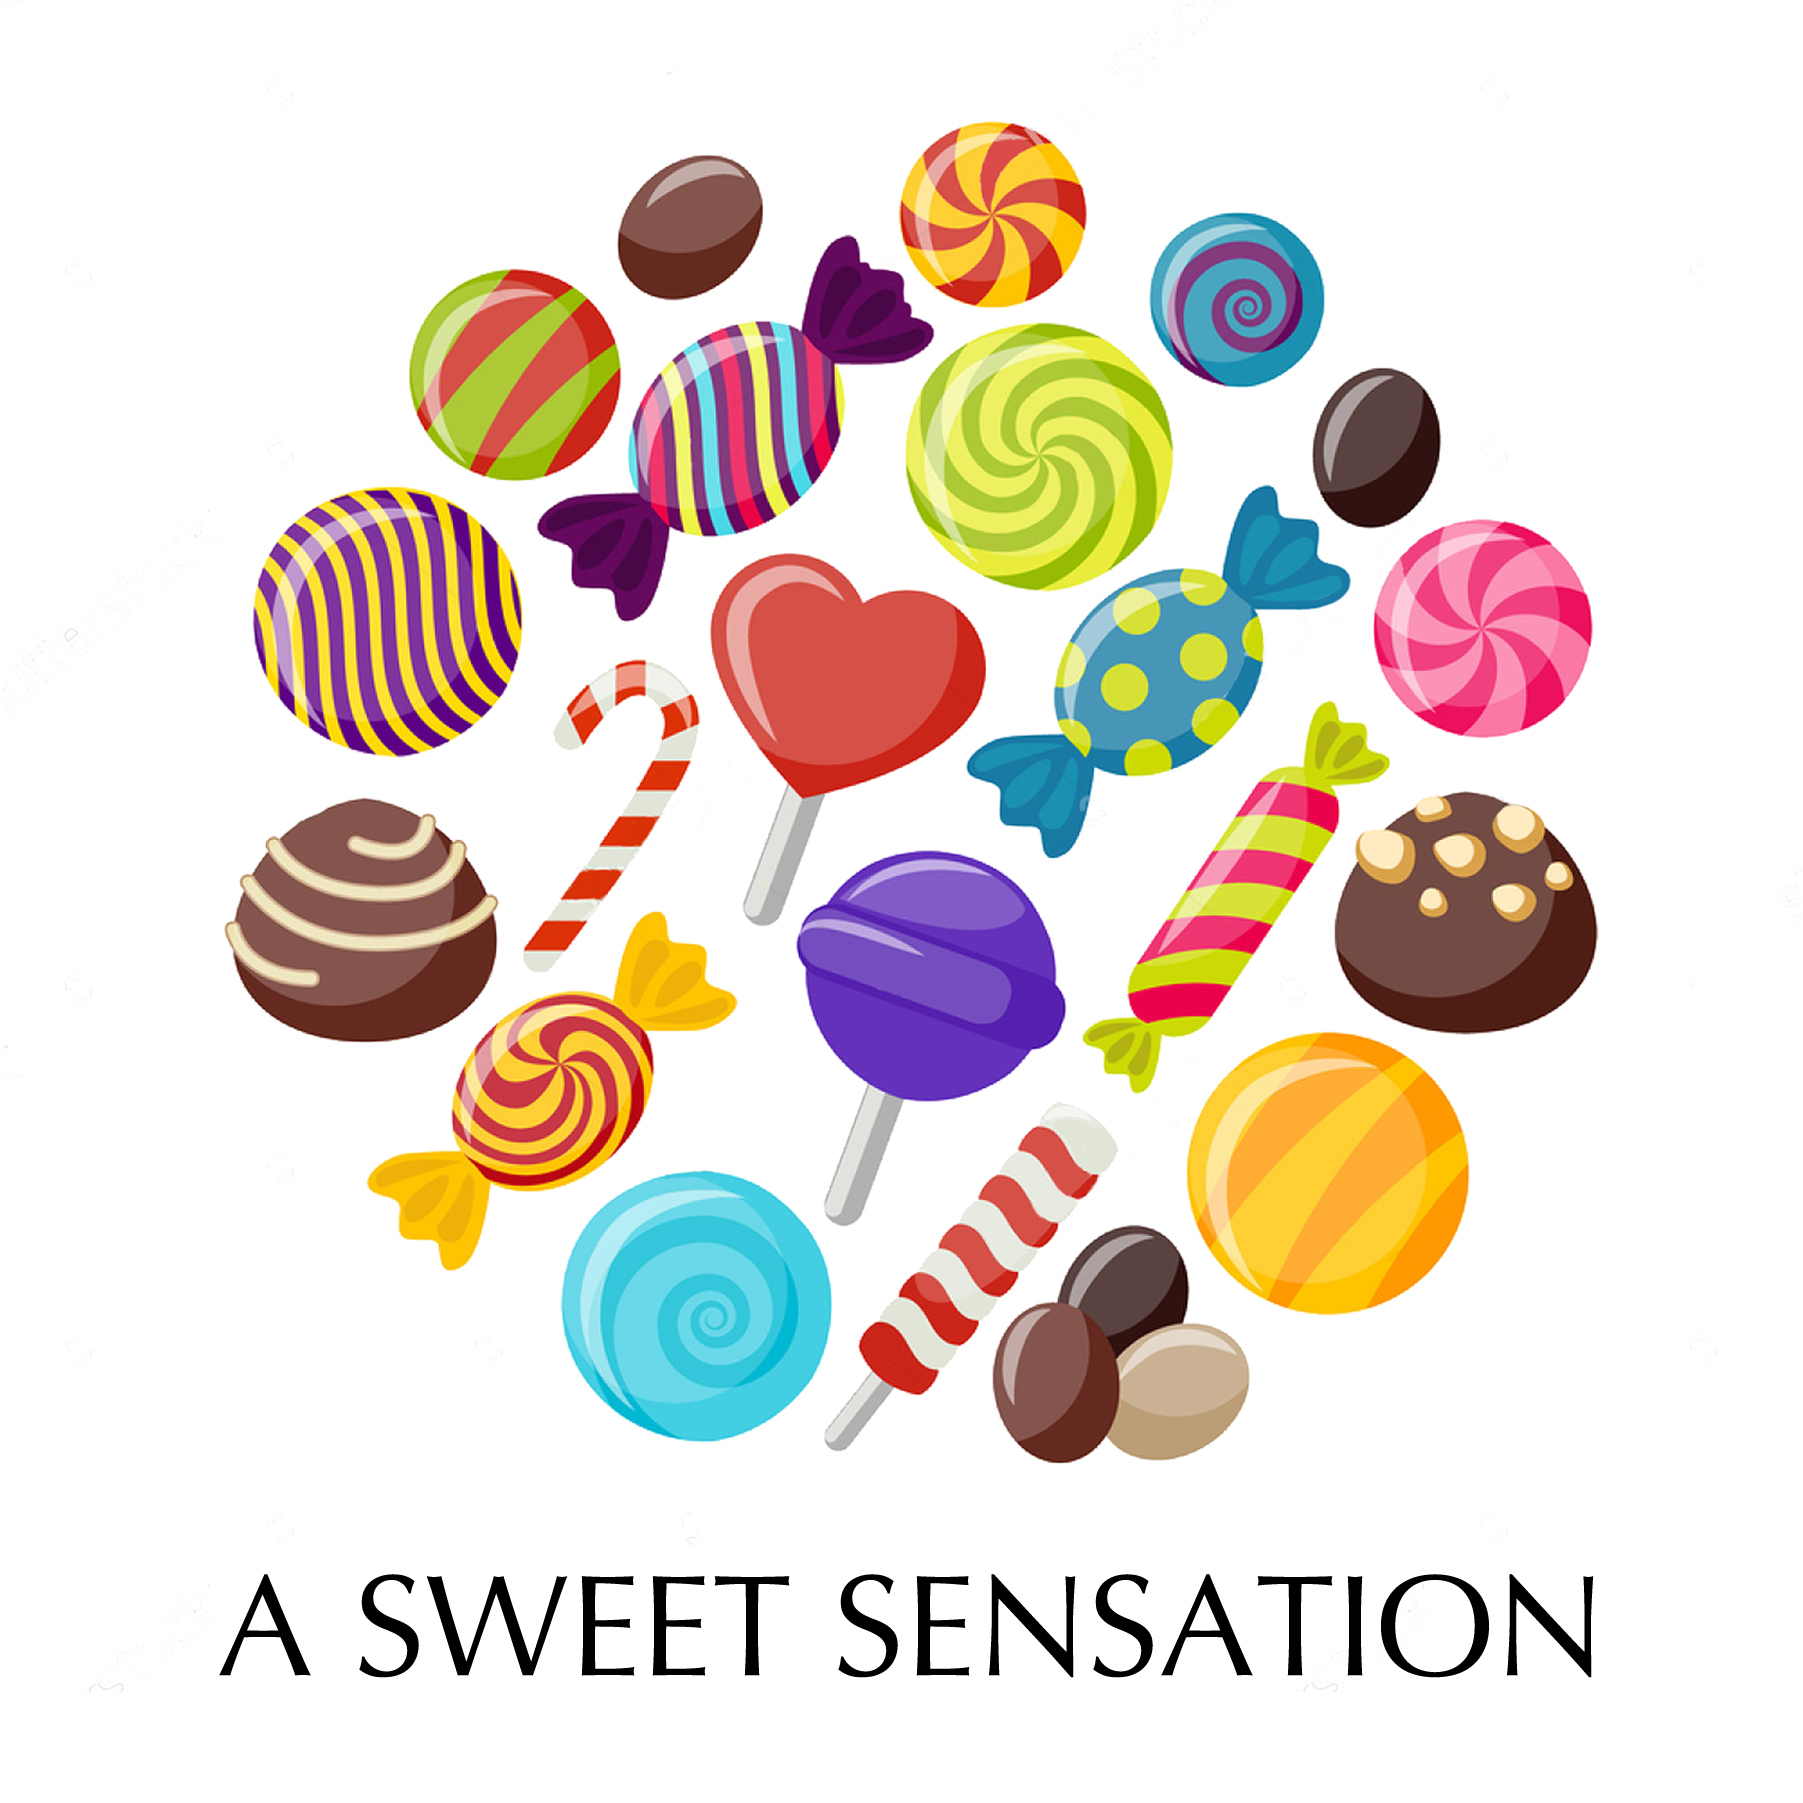 A Sweet Sensation